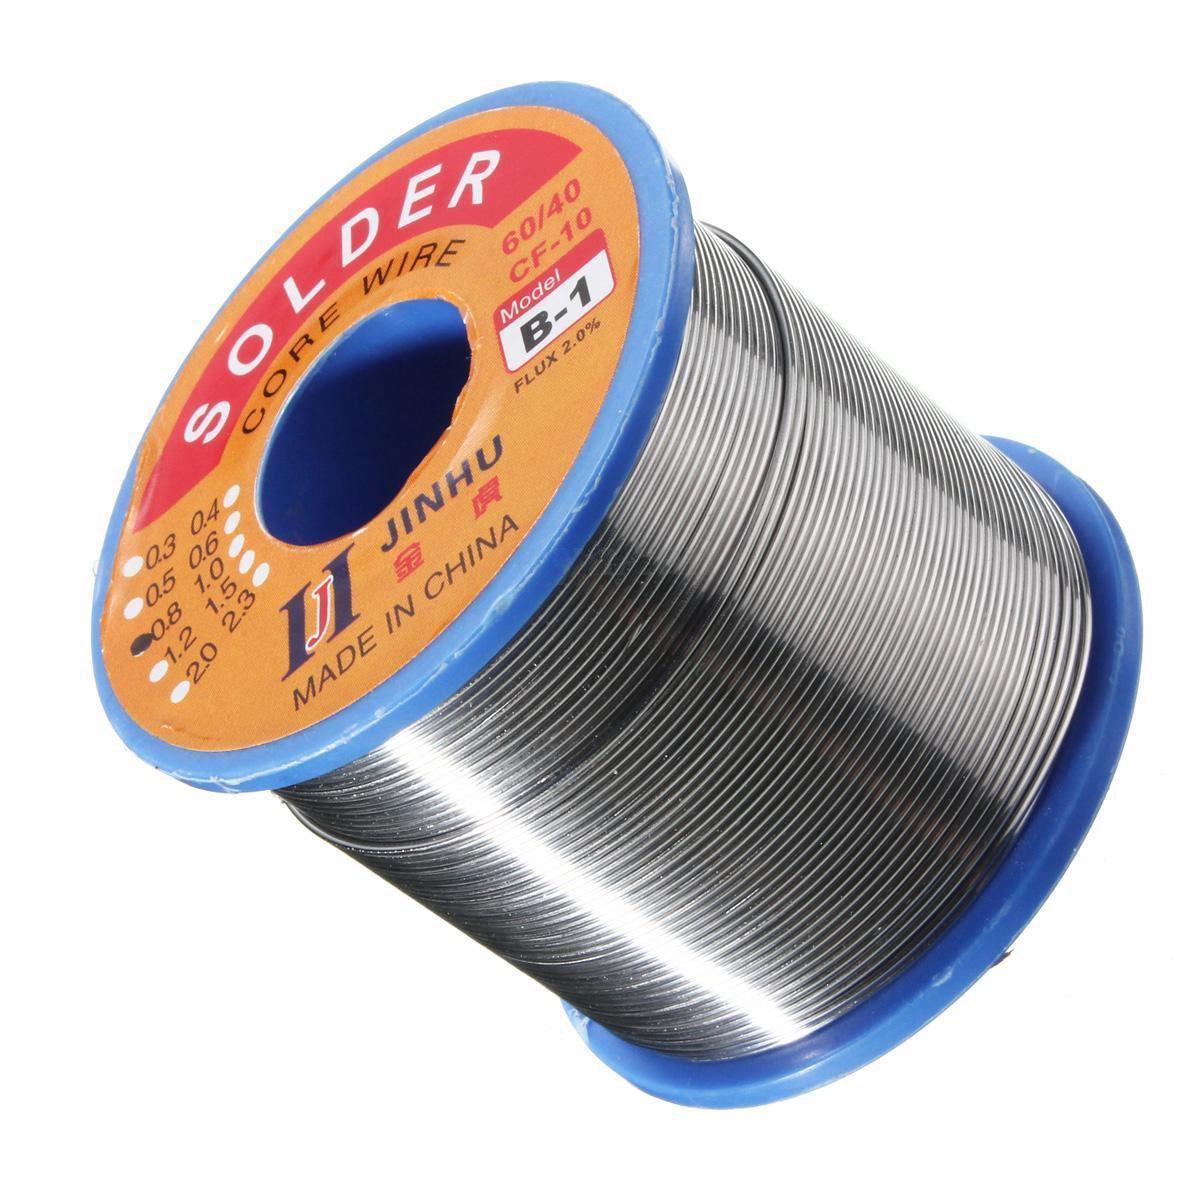 500g 60/40 Zinn blei Lötdraht Rosin Core Löten 2% Flux, 0,7 Mm 1 Reel